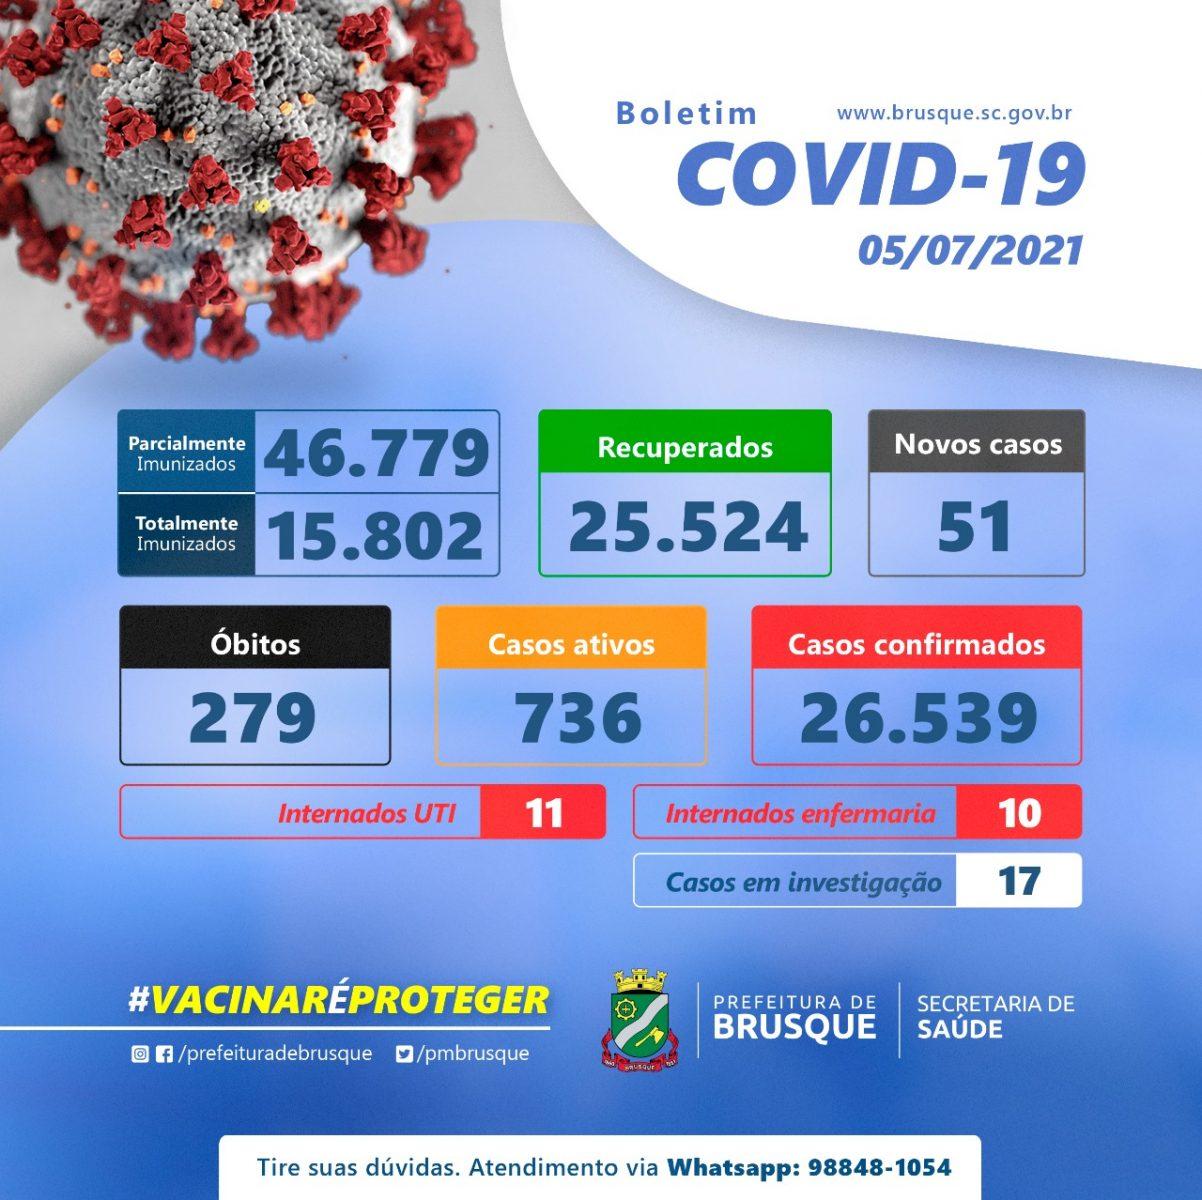 Covid-19: Confira o boletim epidemiológico desta segunda-feira (05)